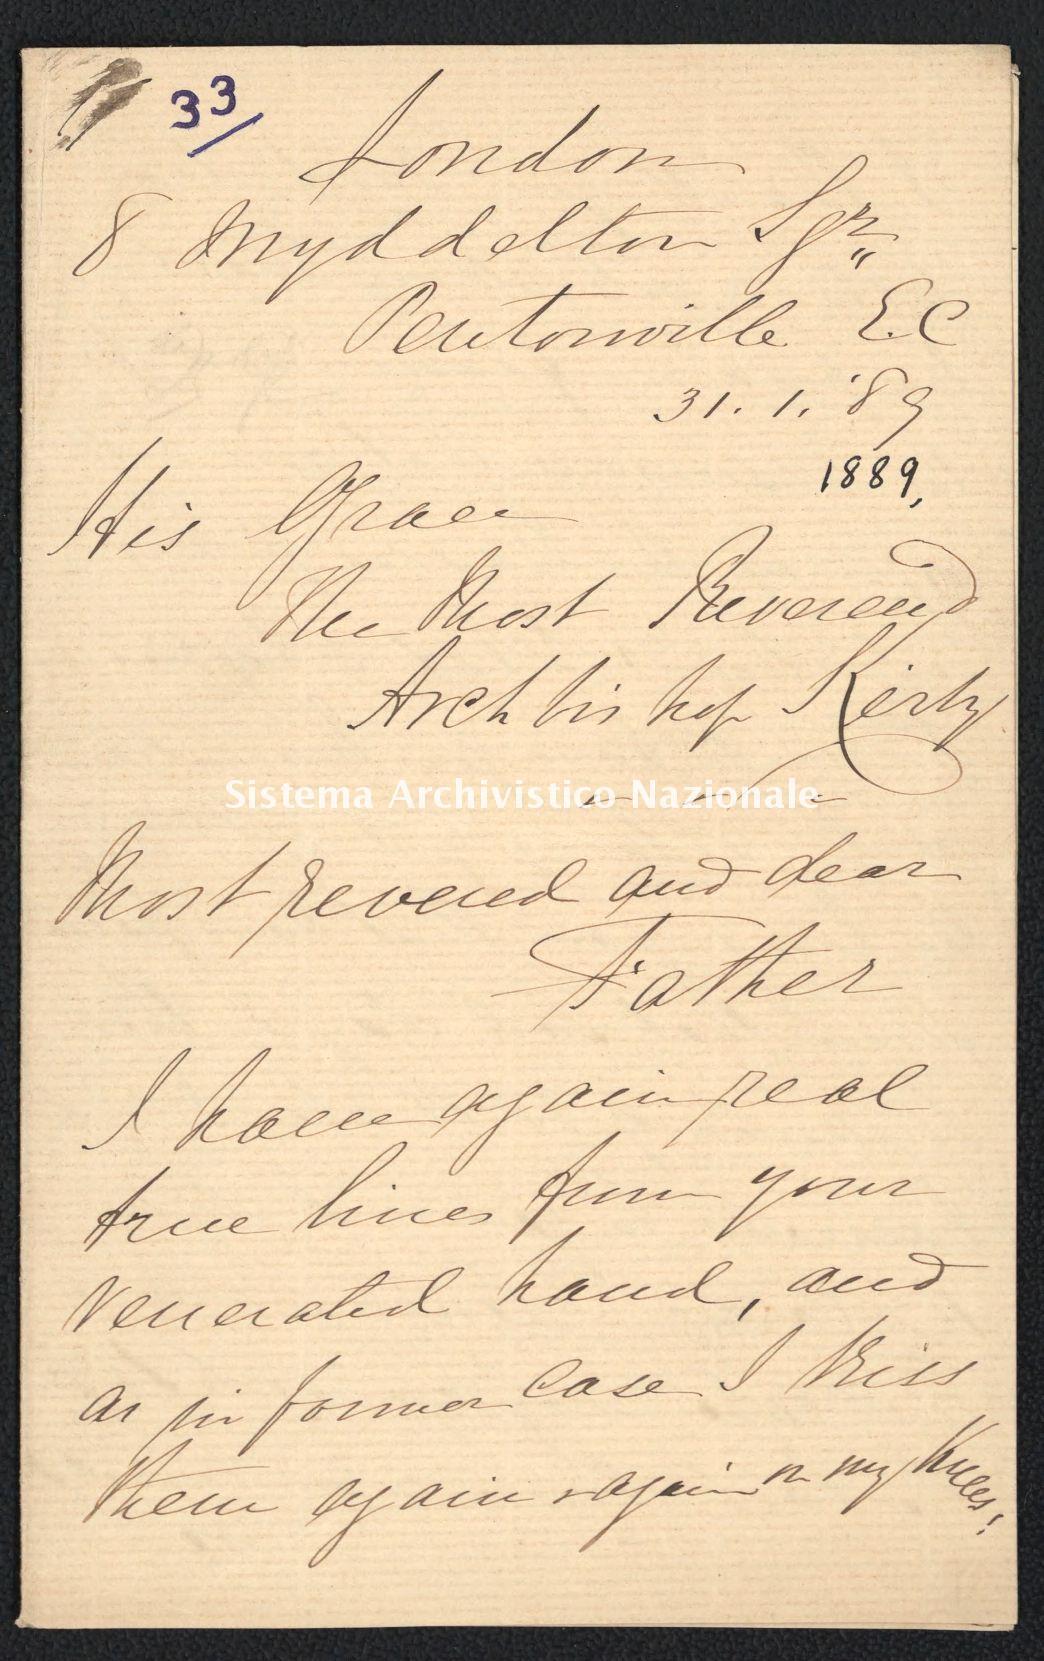 Pontificio Collegio Irlandese - Kirby_1889_33